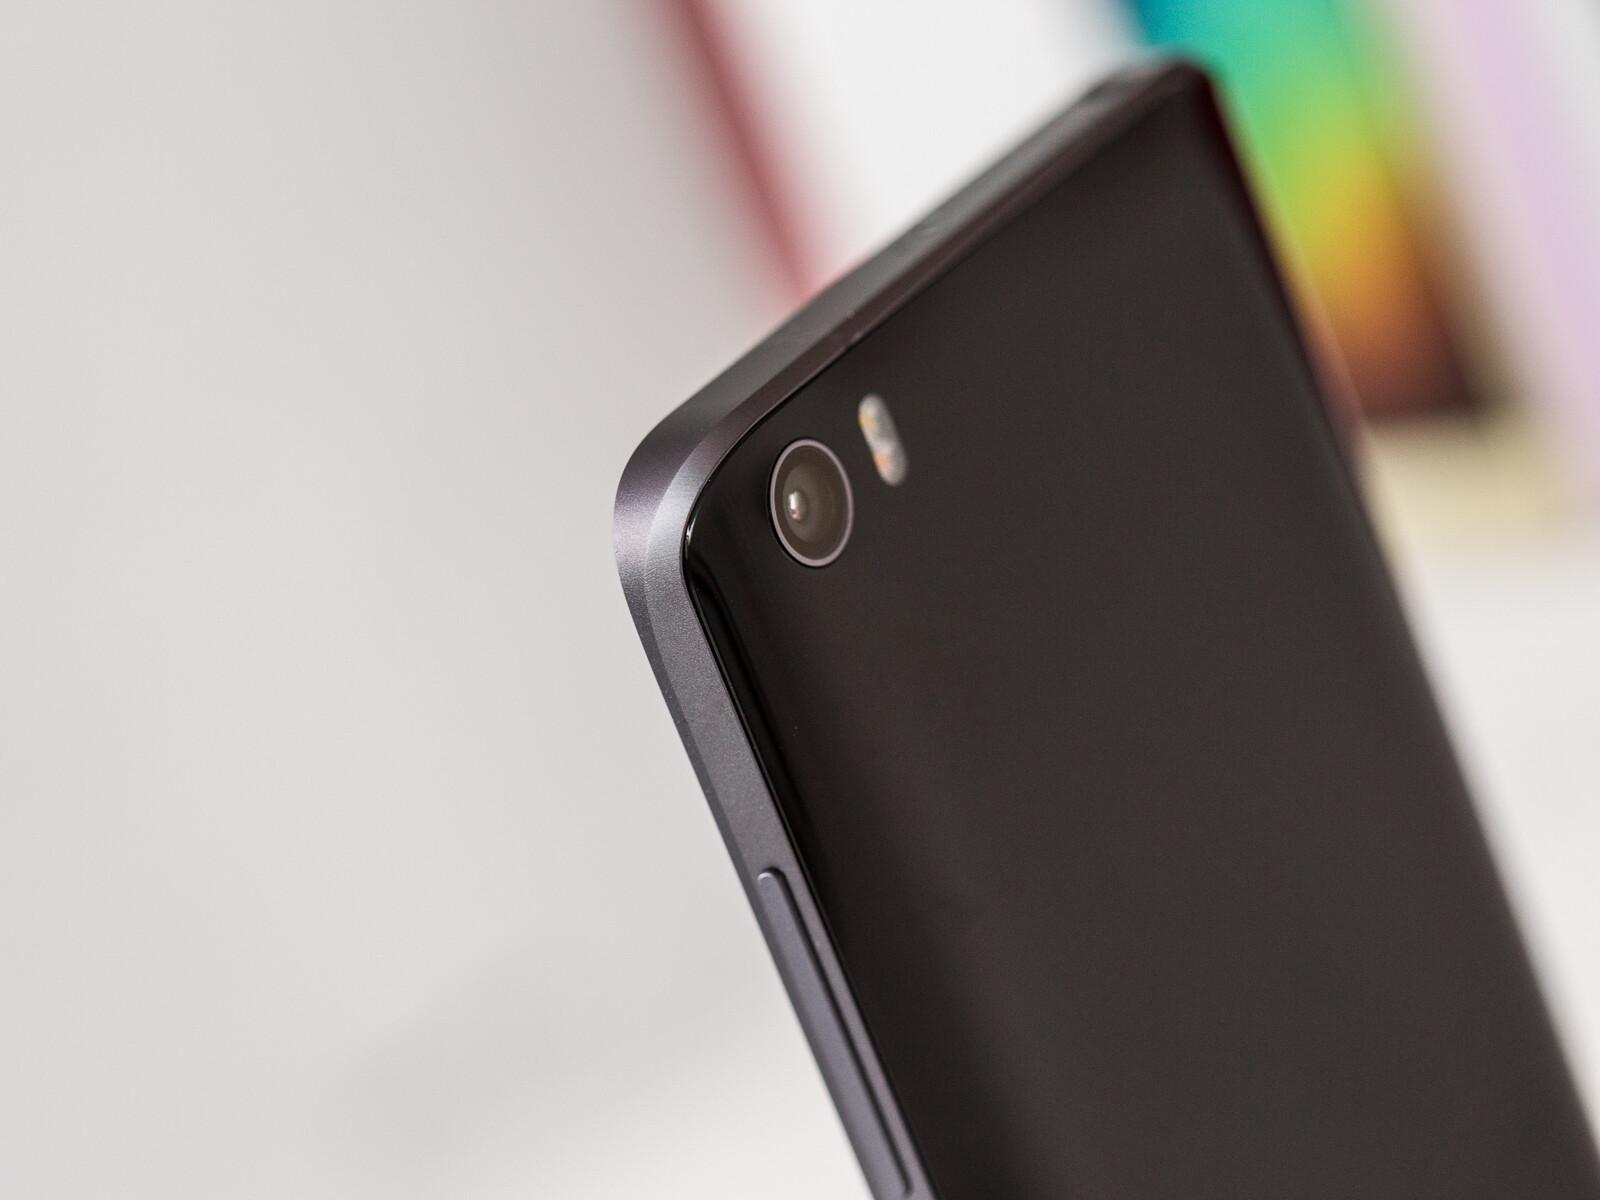 Xiaomi Mi 5 Photos